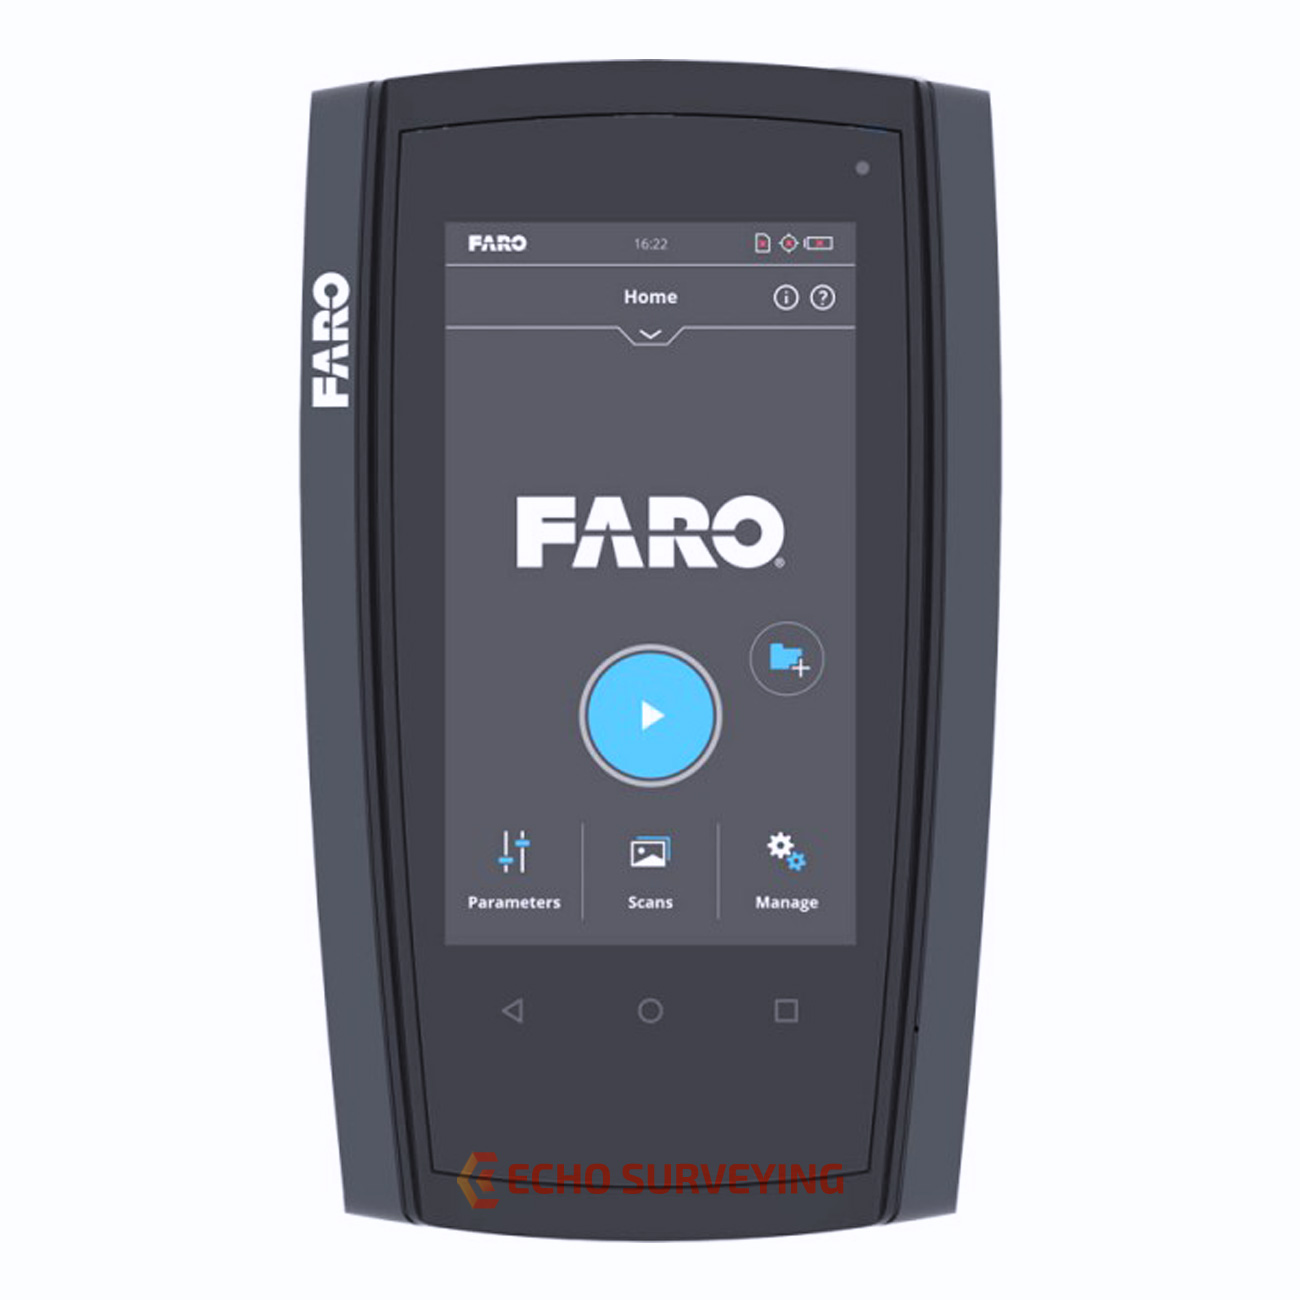 Faro-Focus-S70-price.jpg